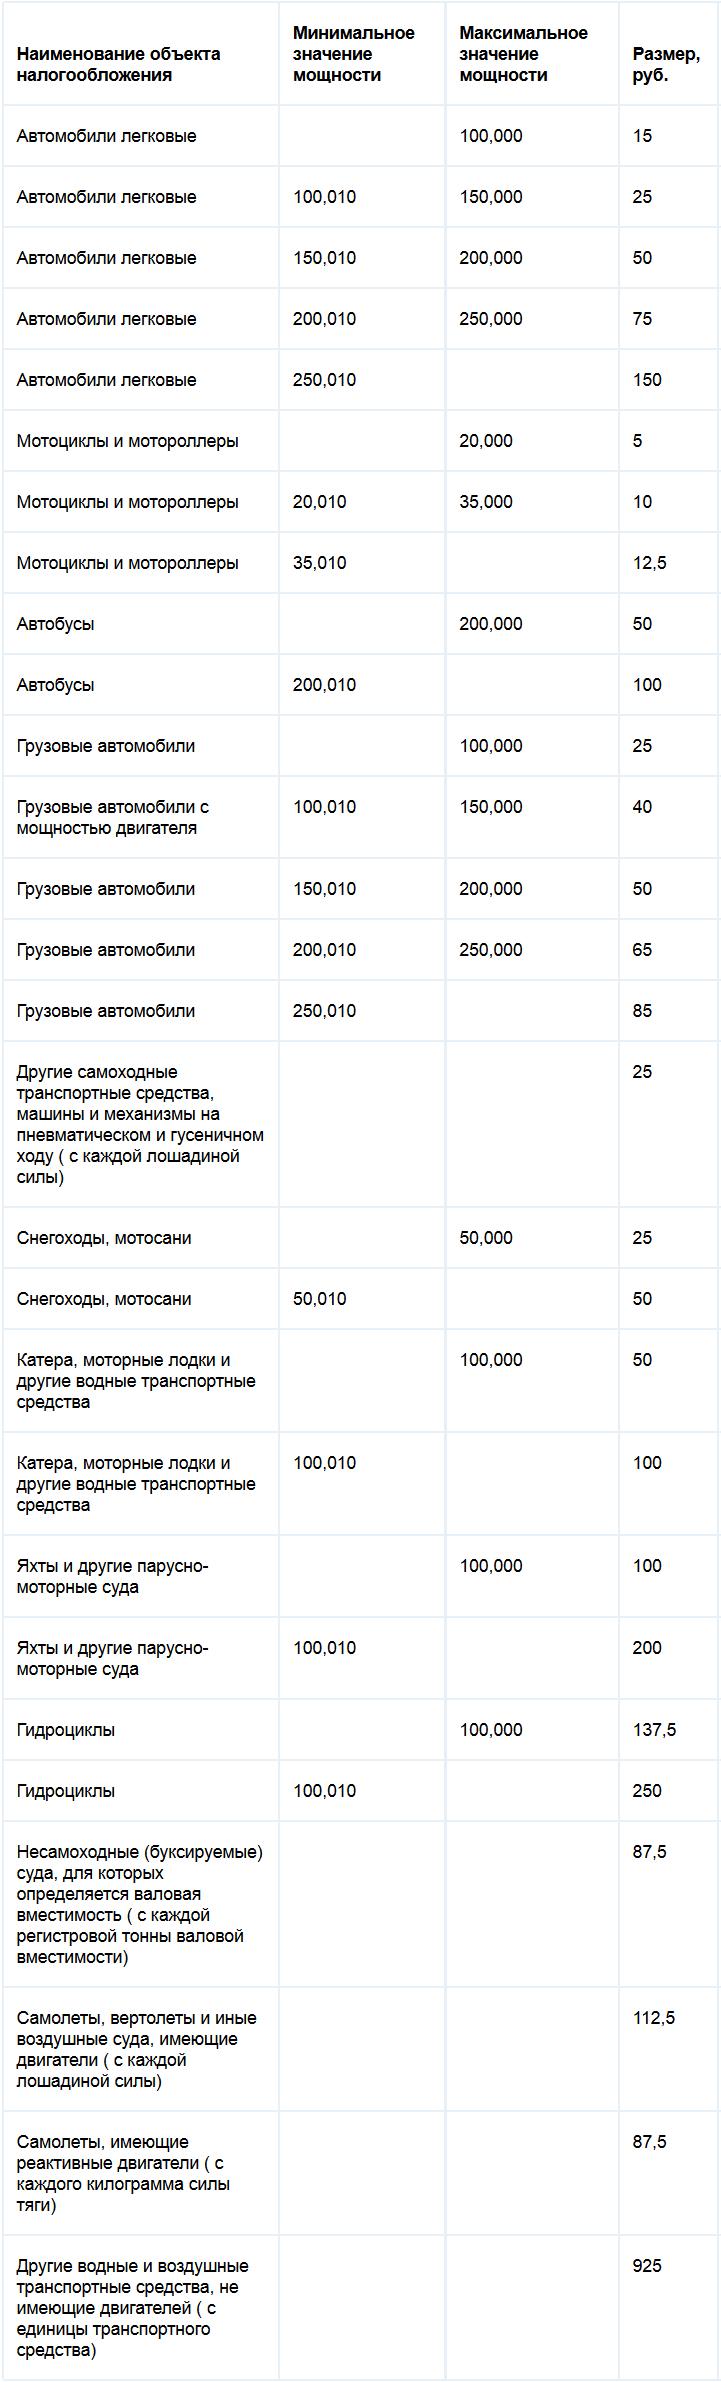 Ставки транспортного налога Белгородской области